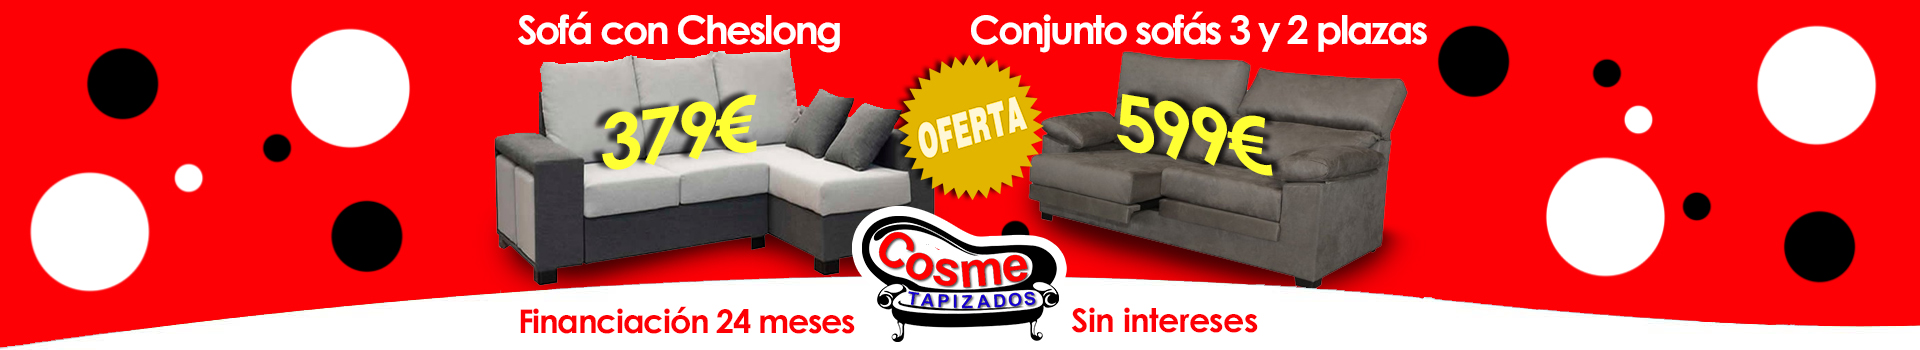 TAPIZADOS COSME, Sillones en Almoradí, sillones relax, sillones vega baja, sillones orejeros, oferta